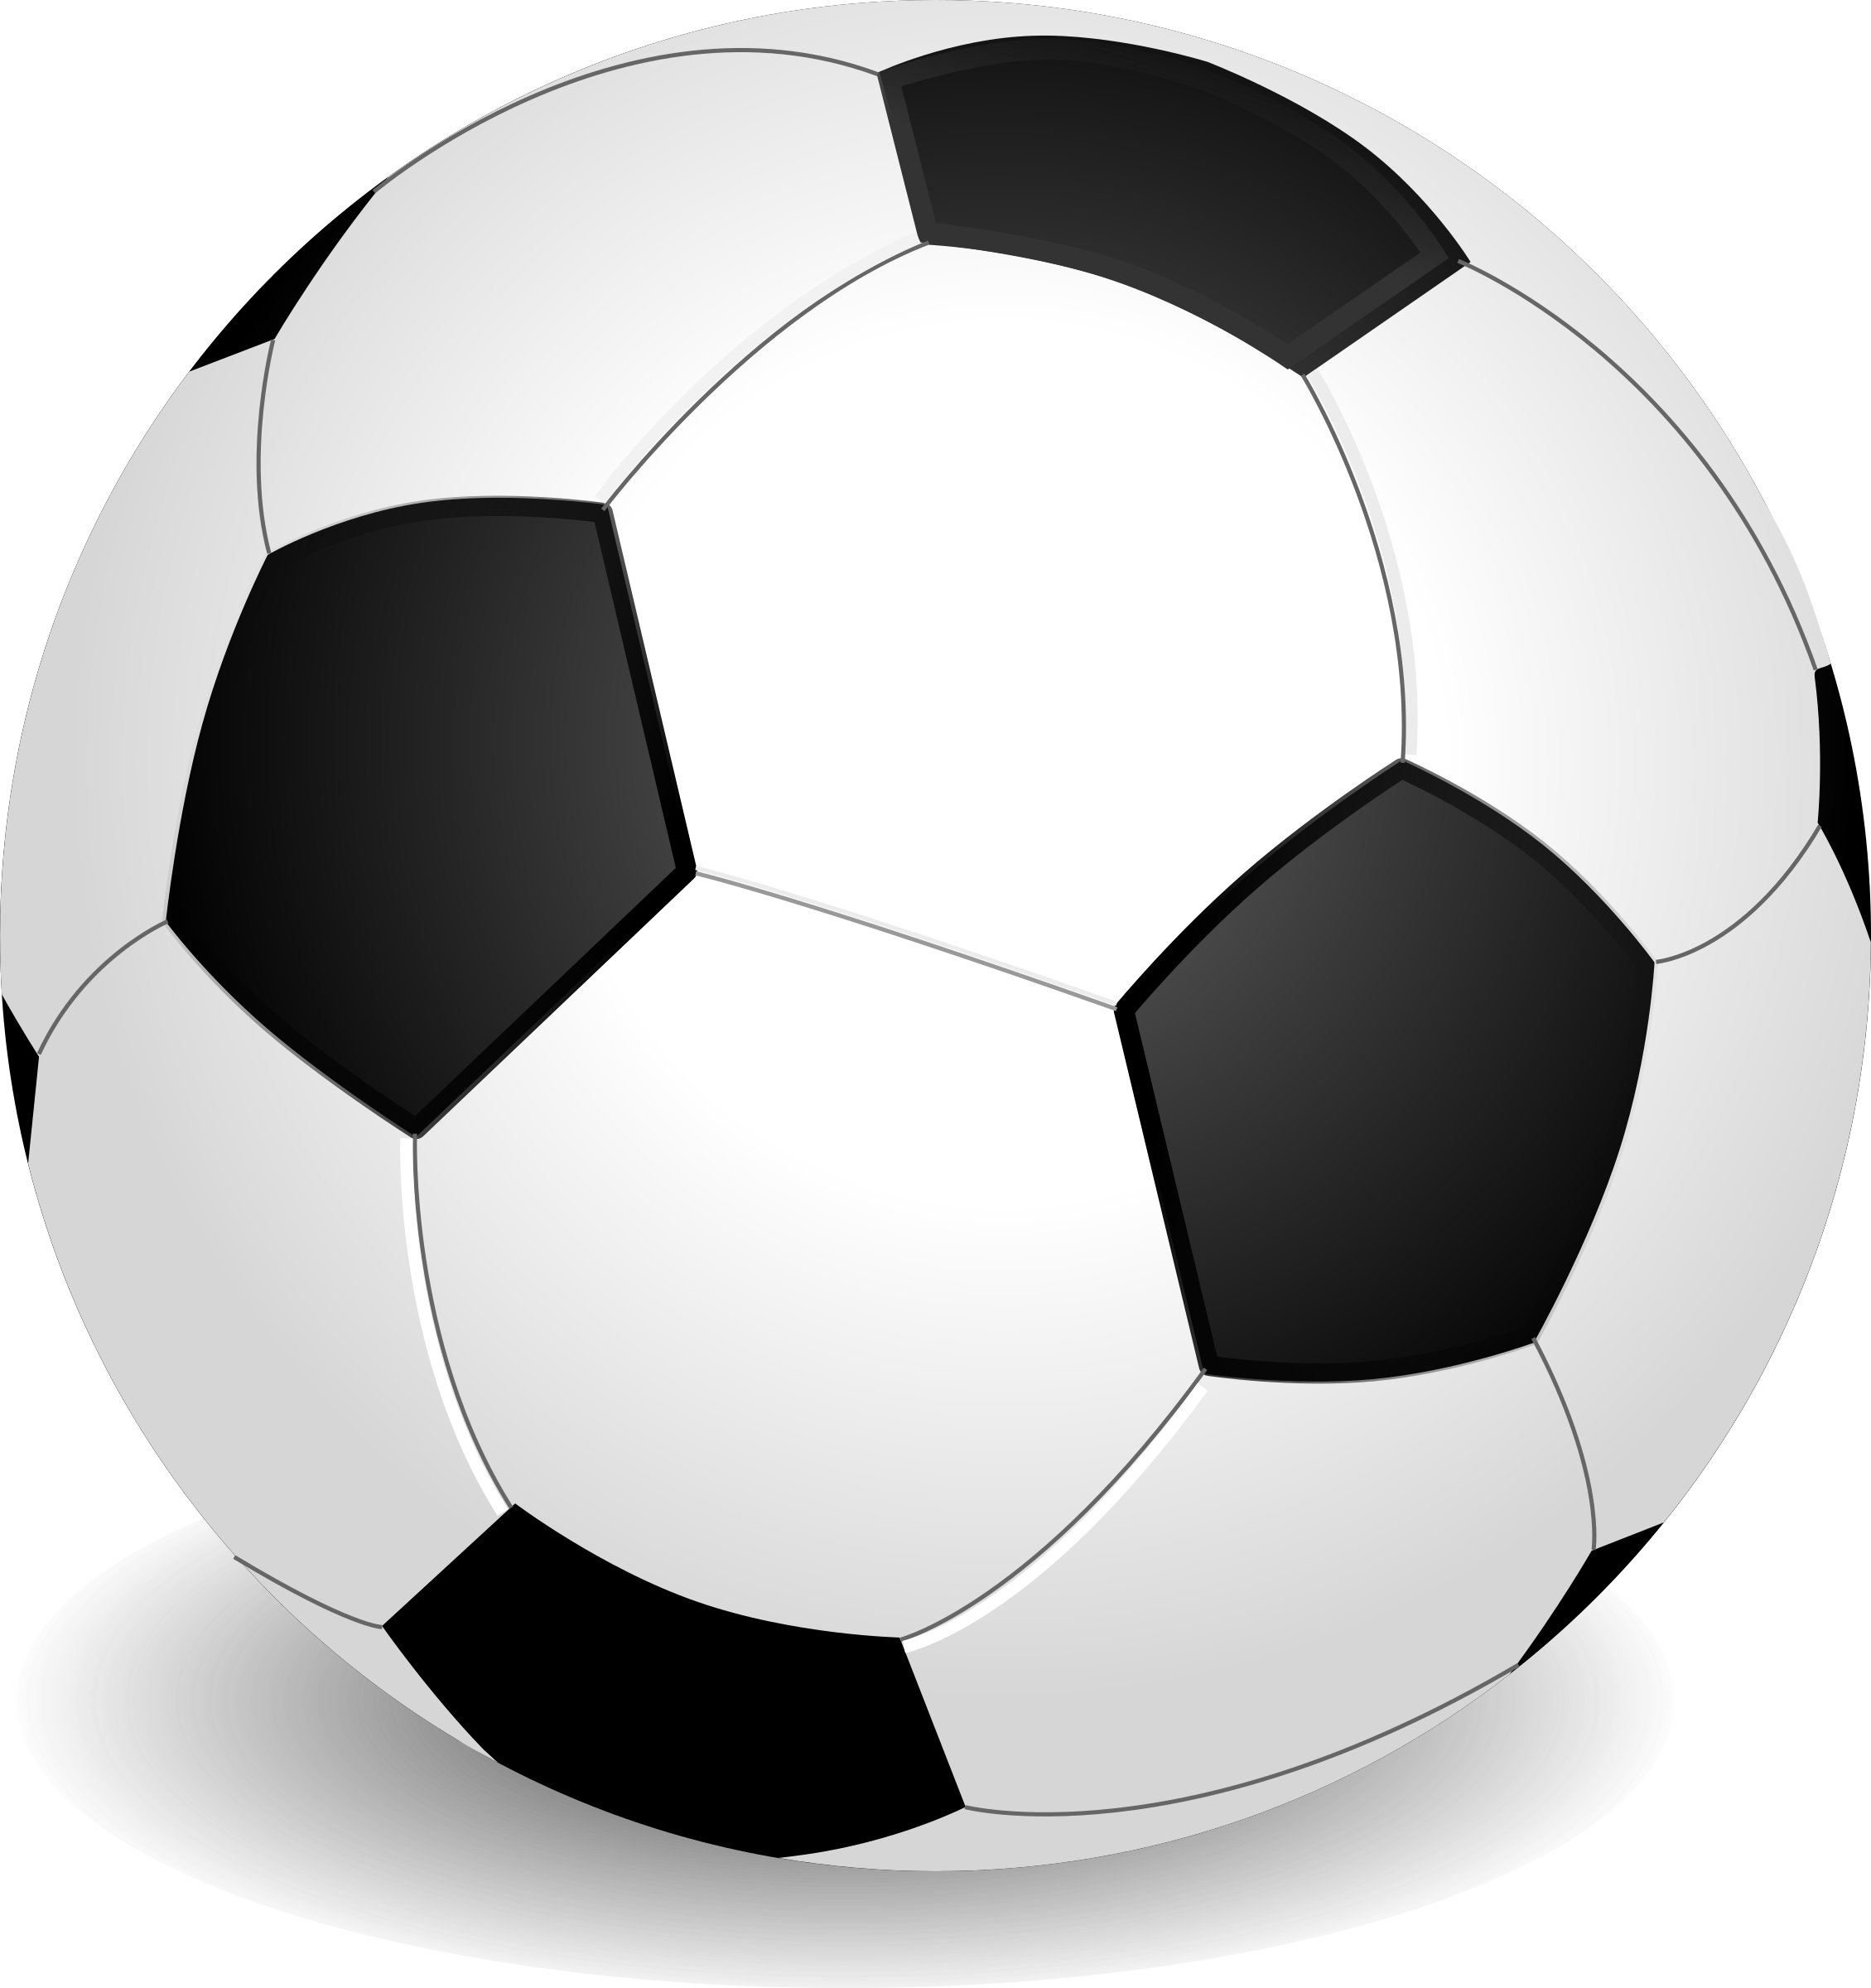 Free Soccer Football Cliparts, Download Free Clip Art, Free Clip Art.